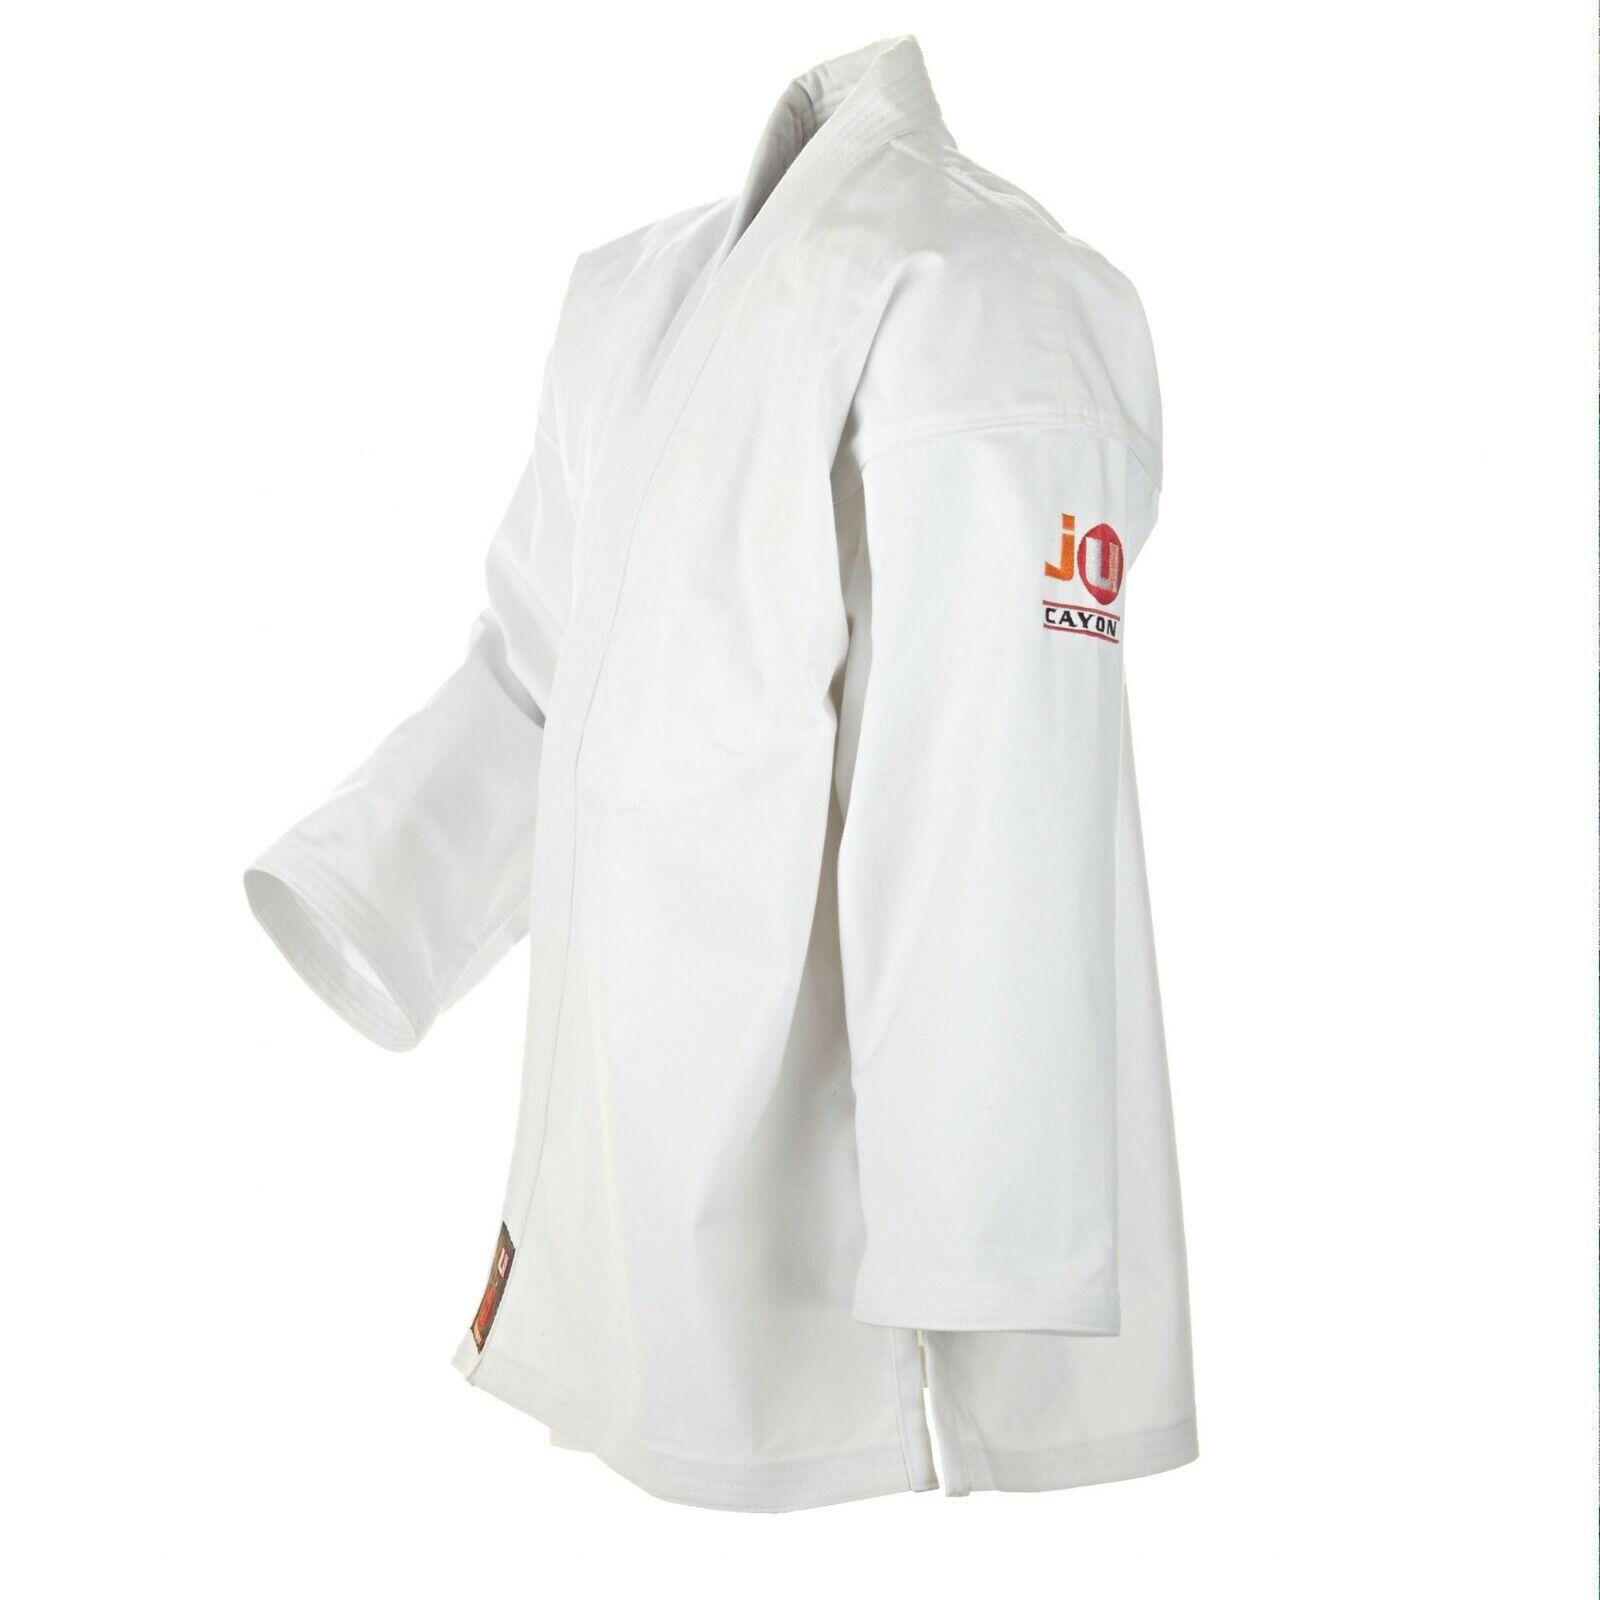 Ju-Jutsu Anzug Ju-Sports  Cayon   SV-Anzug weiß weiß weiß - Jiu-Jitsu Self defence Gi  | Deutschland Online Shop  | Spaß  | Creative  ae9003